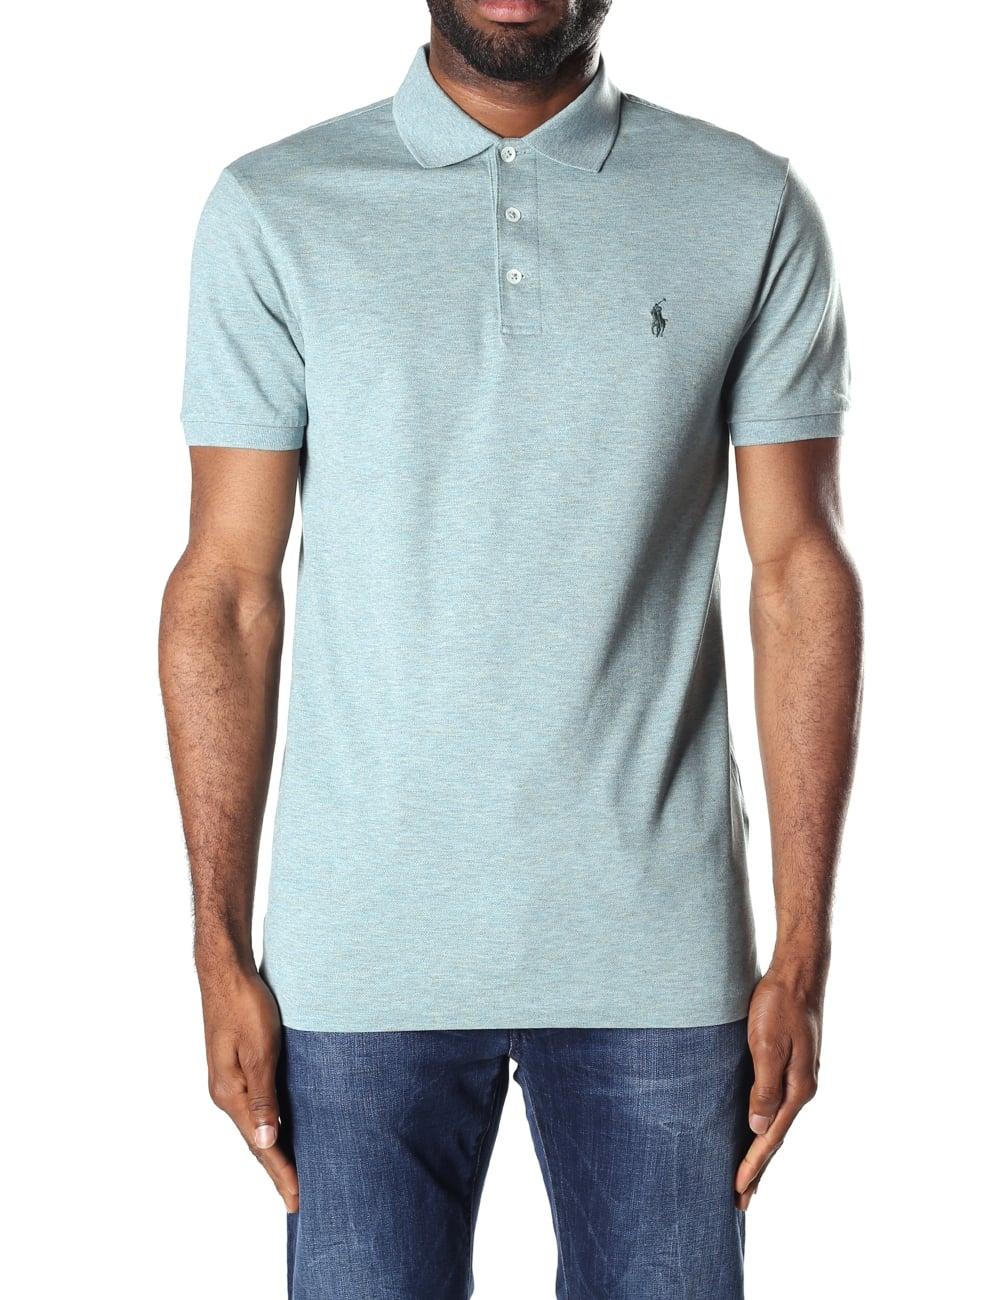 7fd36d1e7 Mens Ralph Lauren Short Sleeve Polo Shirts | Azərbaycan Dillər ...